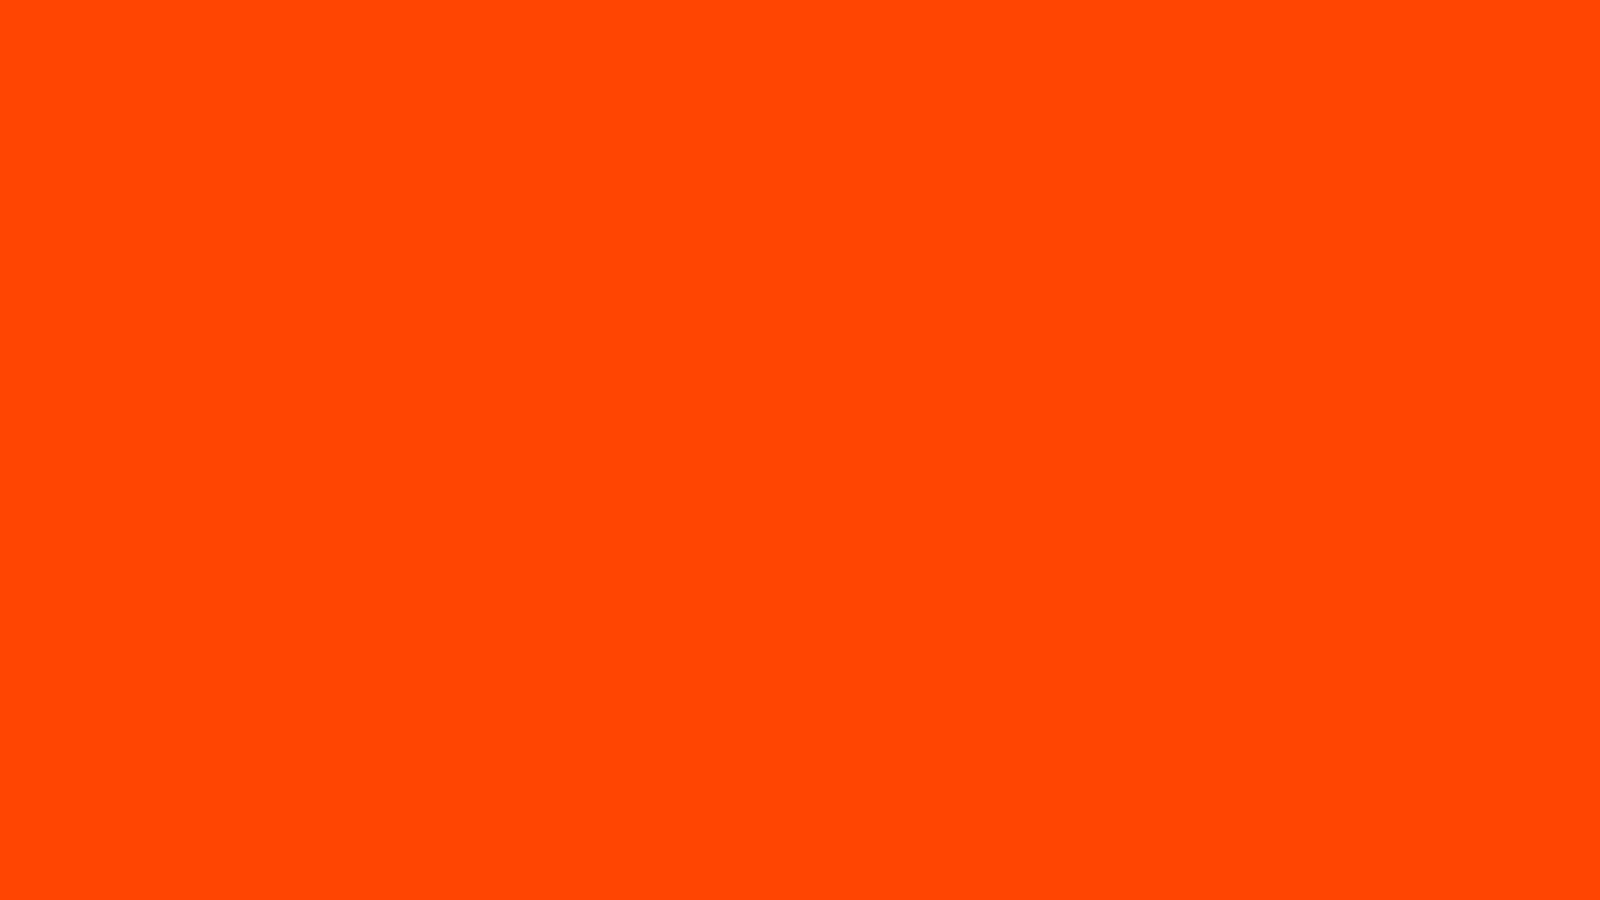 1600x900 Orange-red Solid Color Background